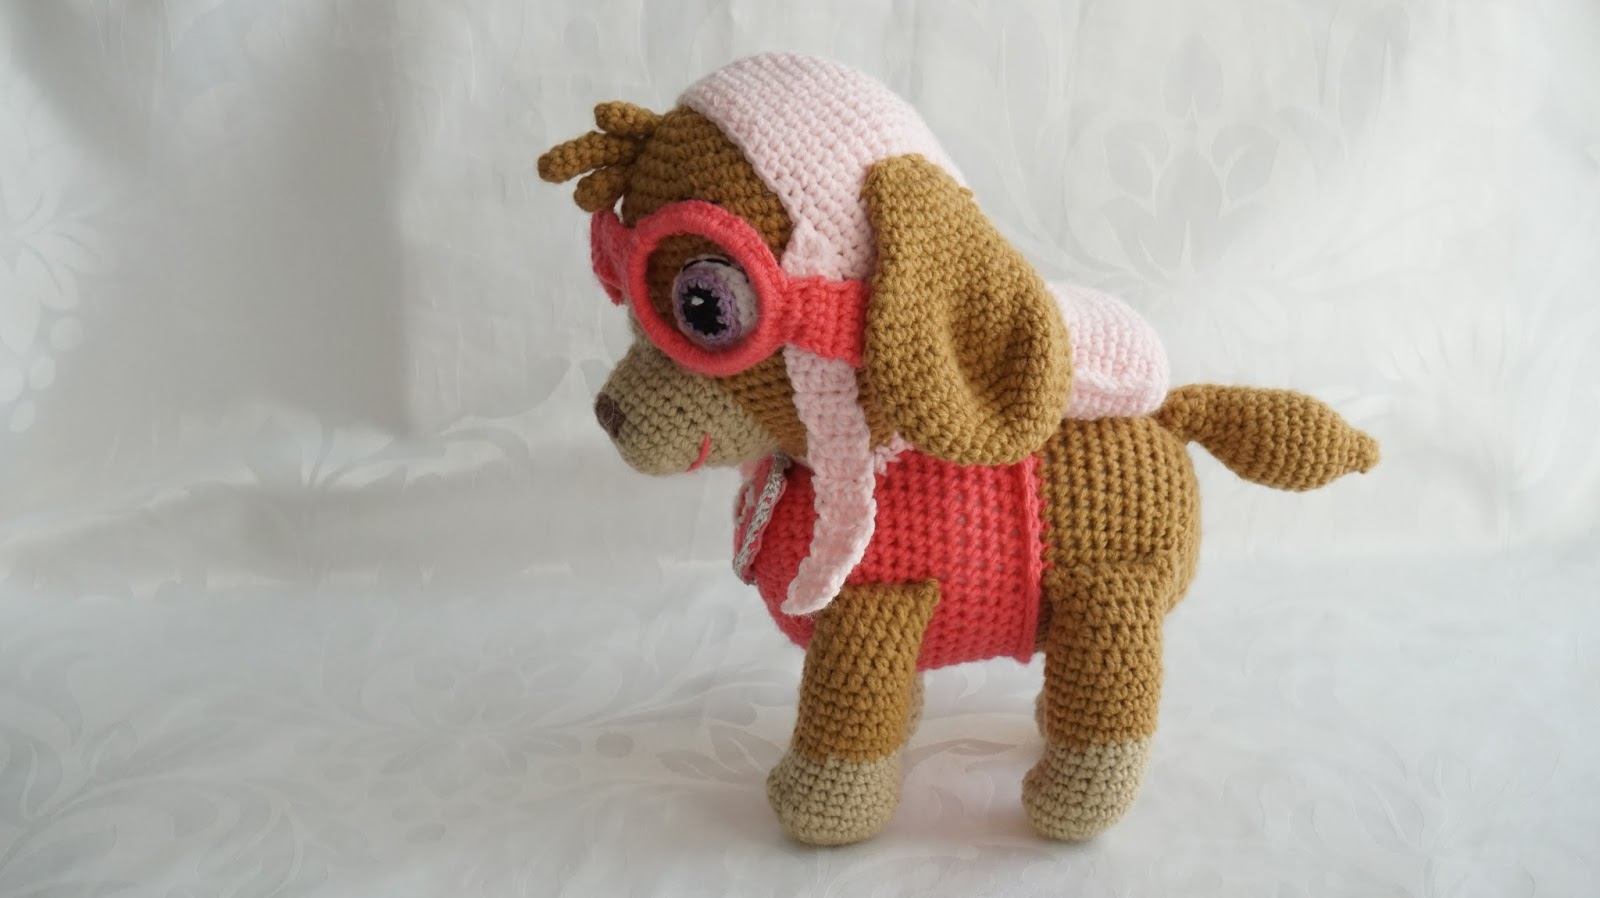 Osito Amigurumi Tutorial Canal Crochet : CANAL CROCHET: Patrulla canina amigurumi tutorial